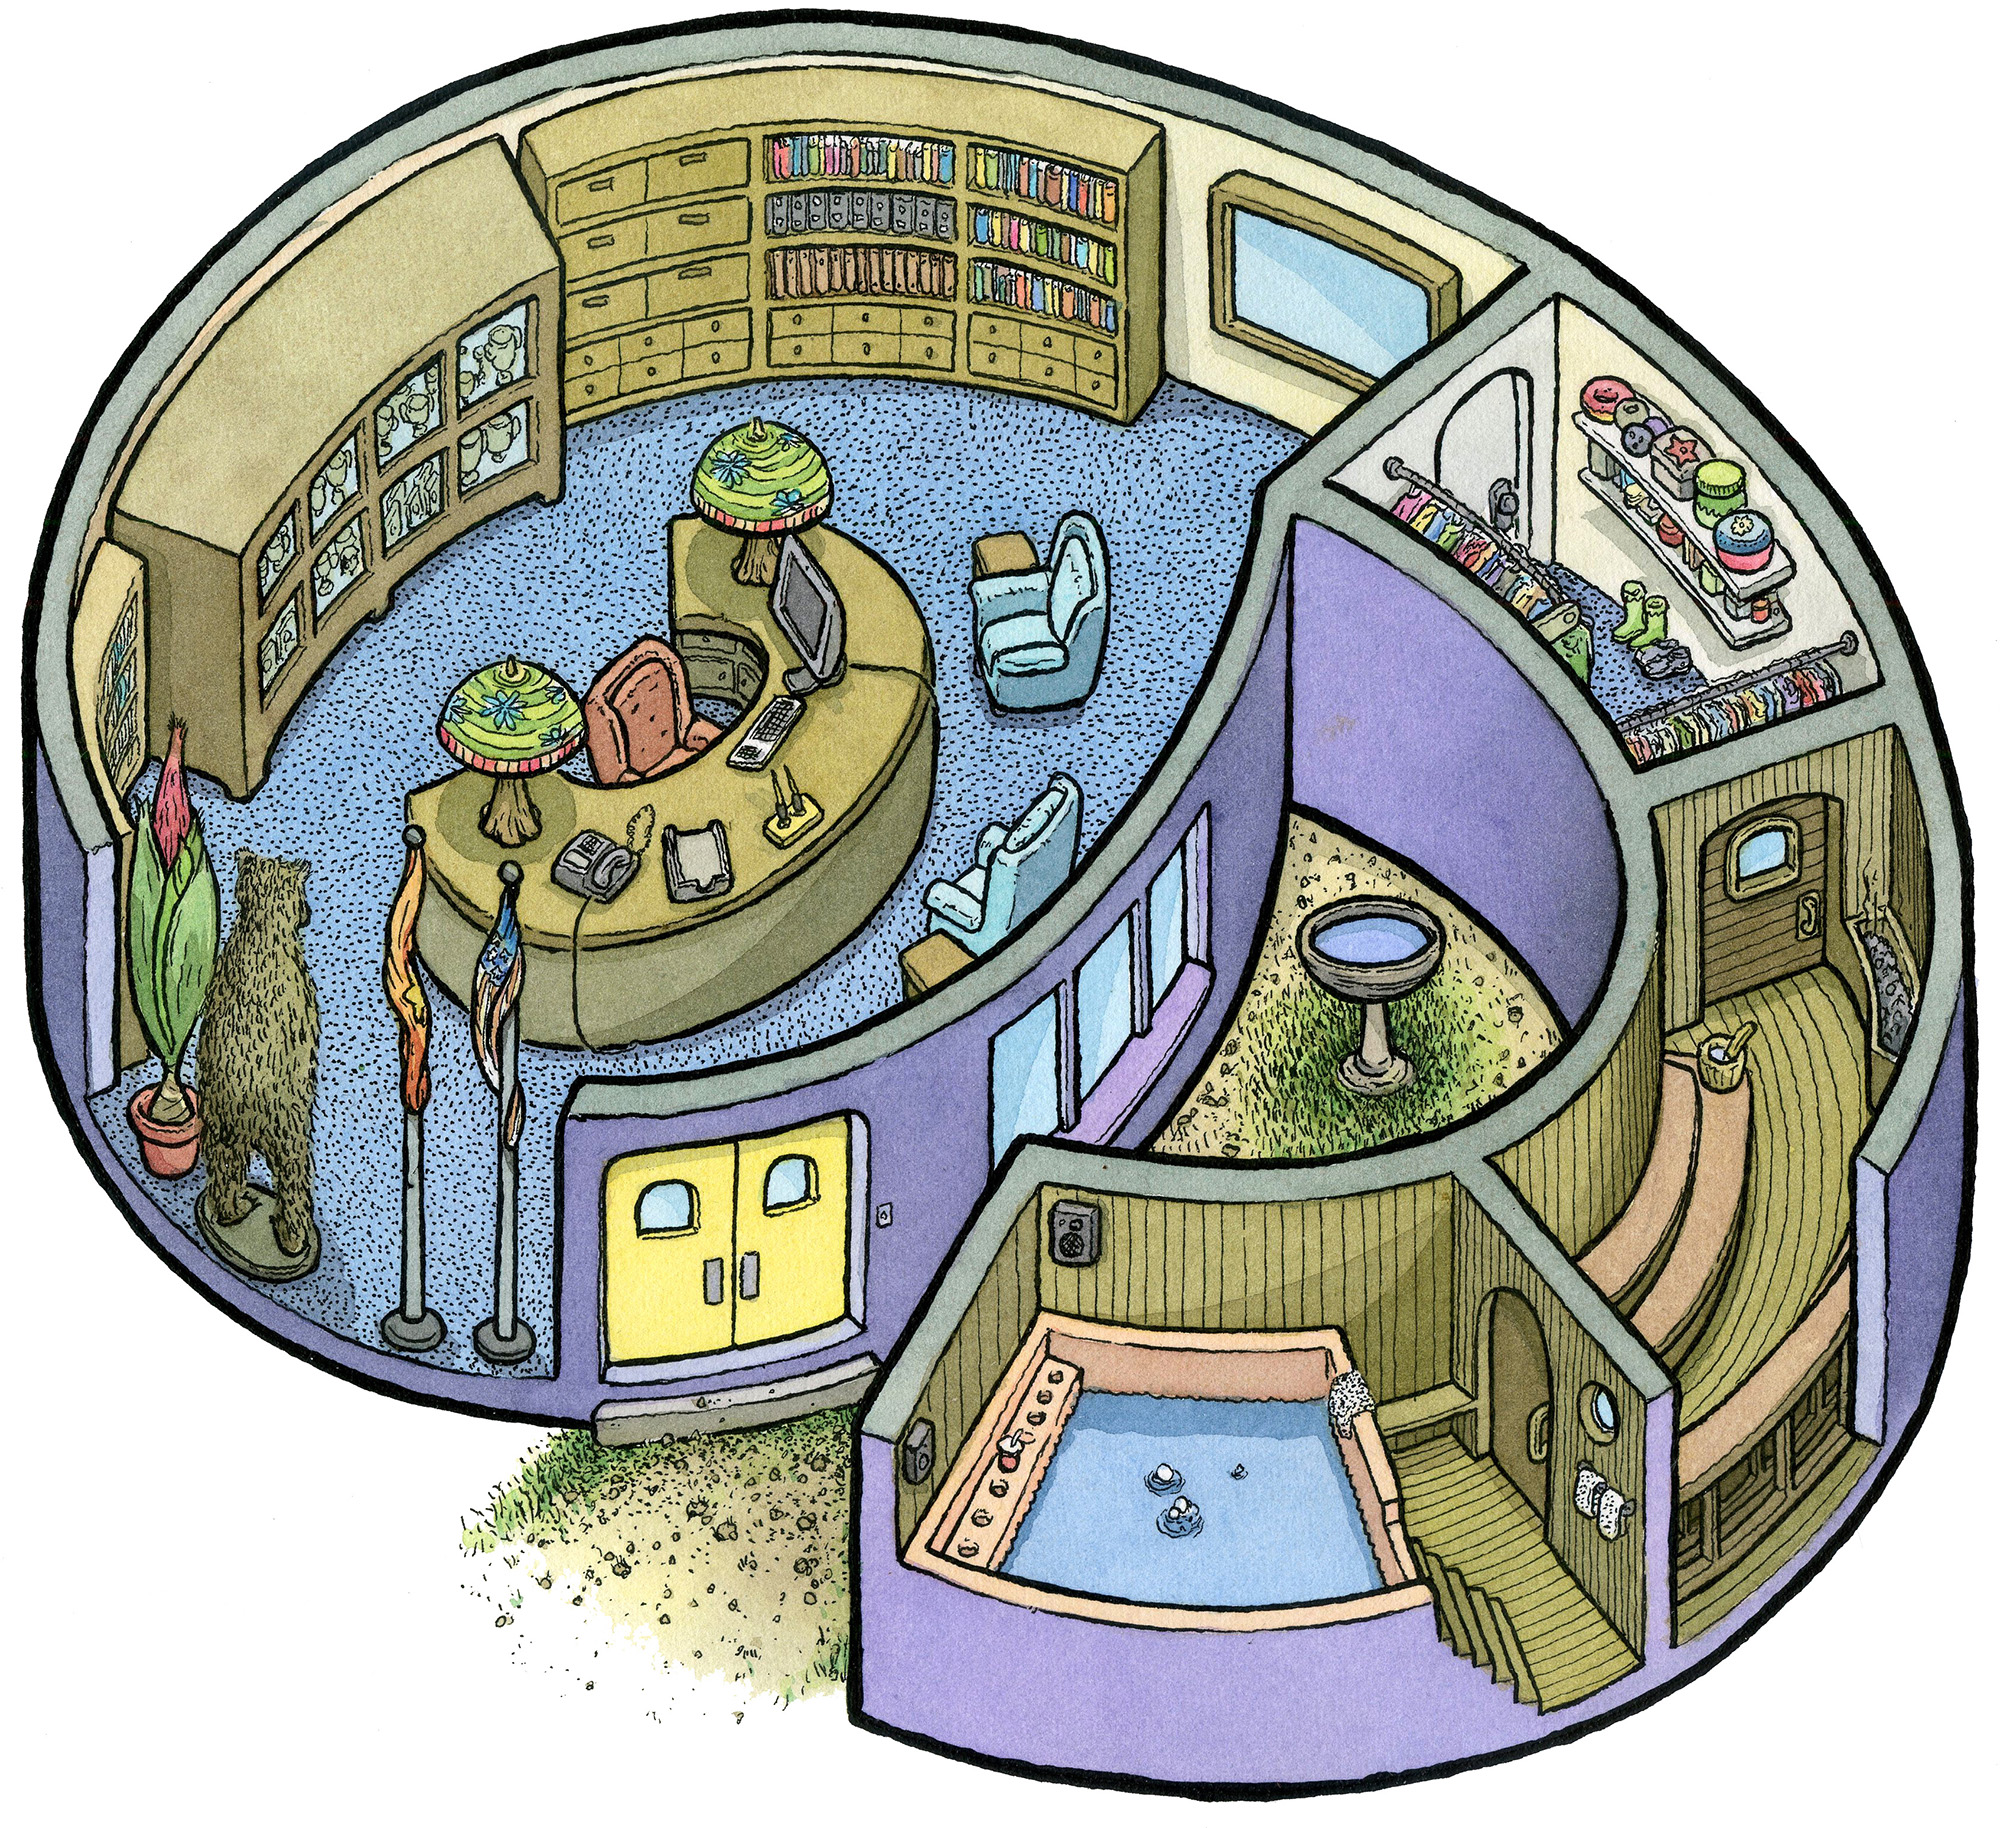 9: Principal's Office/Secret Spa